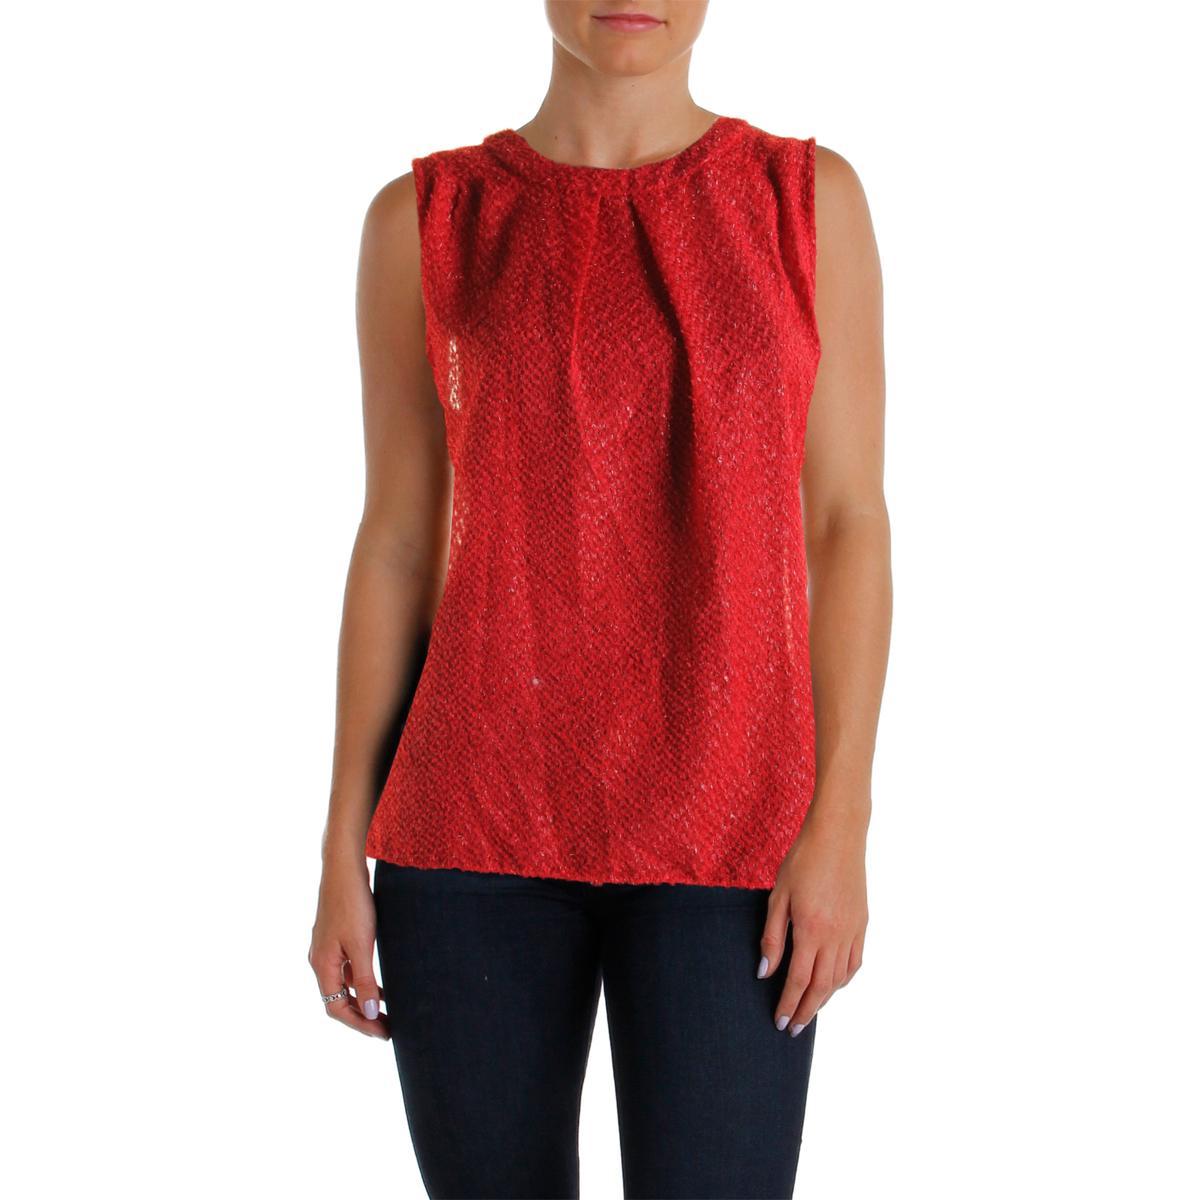 michael michael kors 8606 womens metallic textured pullover top blouse bhfo ebay. Black Bedroom Furniture Sets. Home Design Ideas